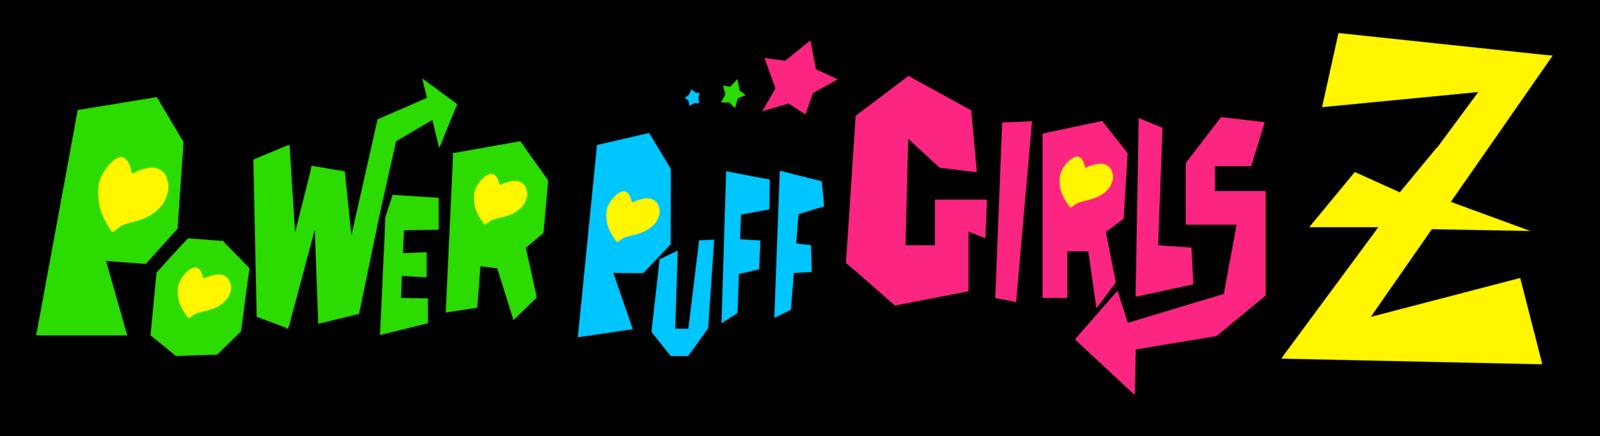 Power Puff Girls Z Logo Vector By Greenmachine987 D8uze4c